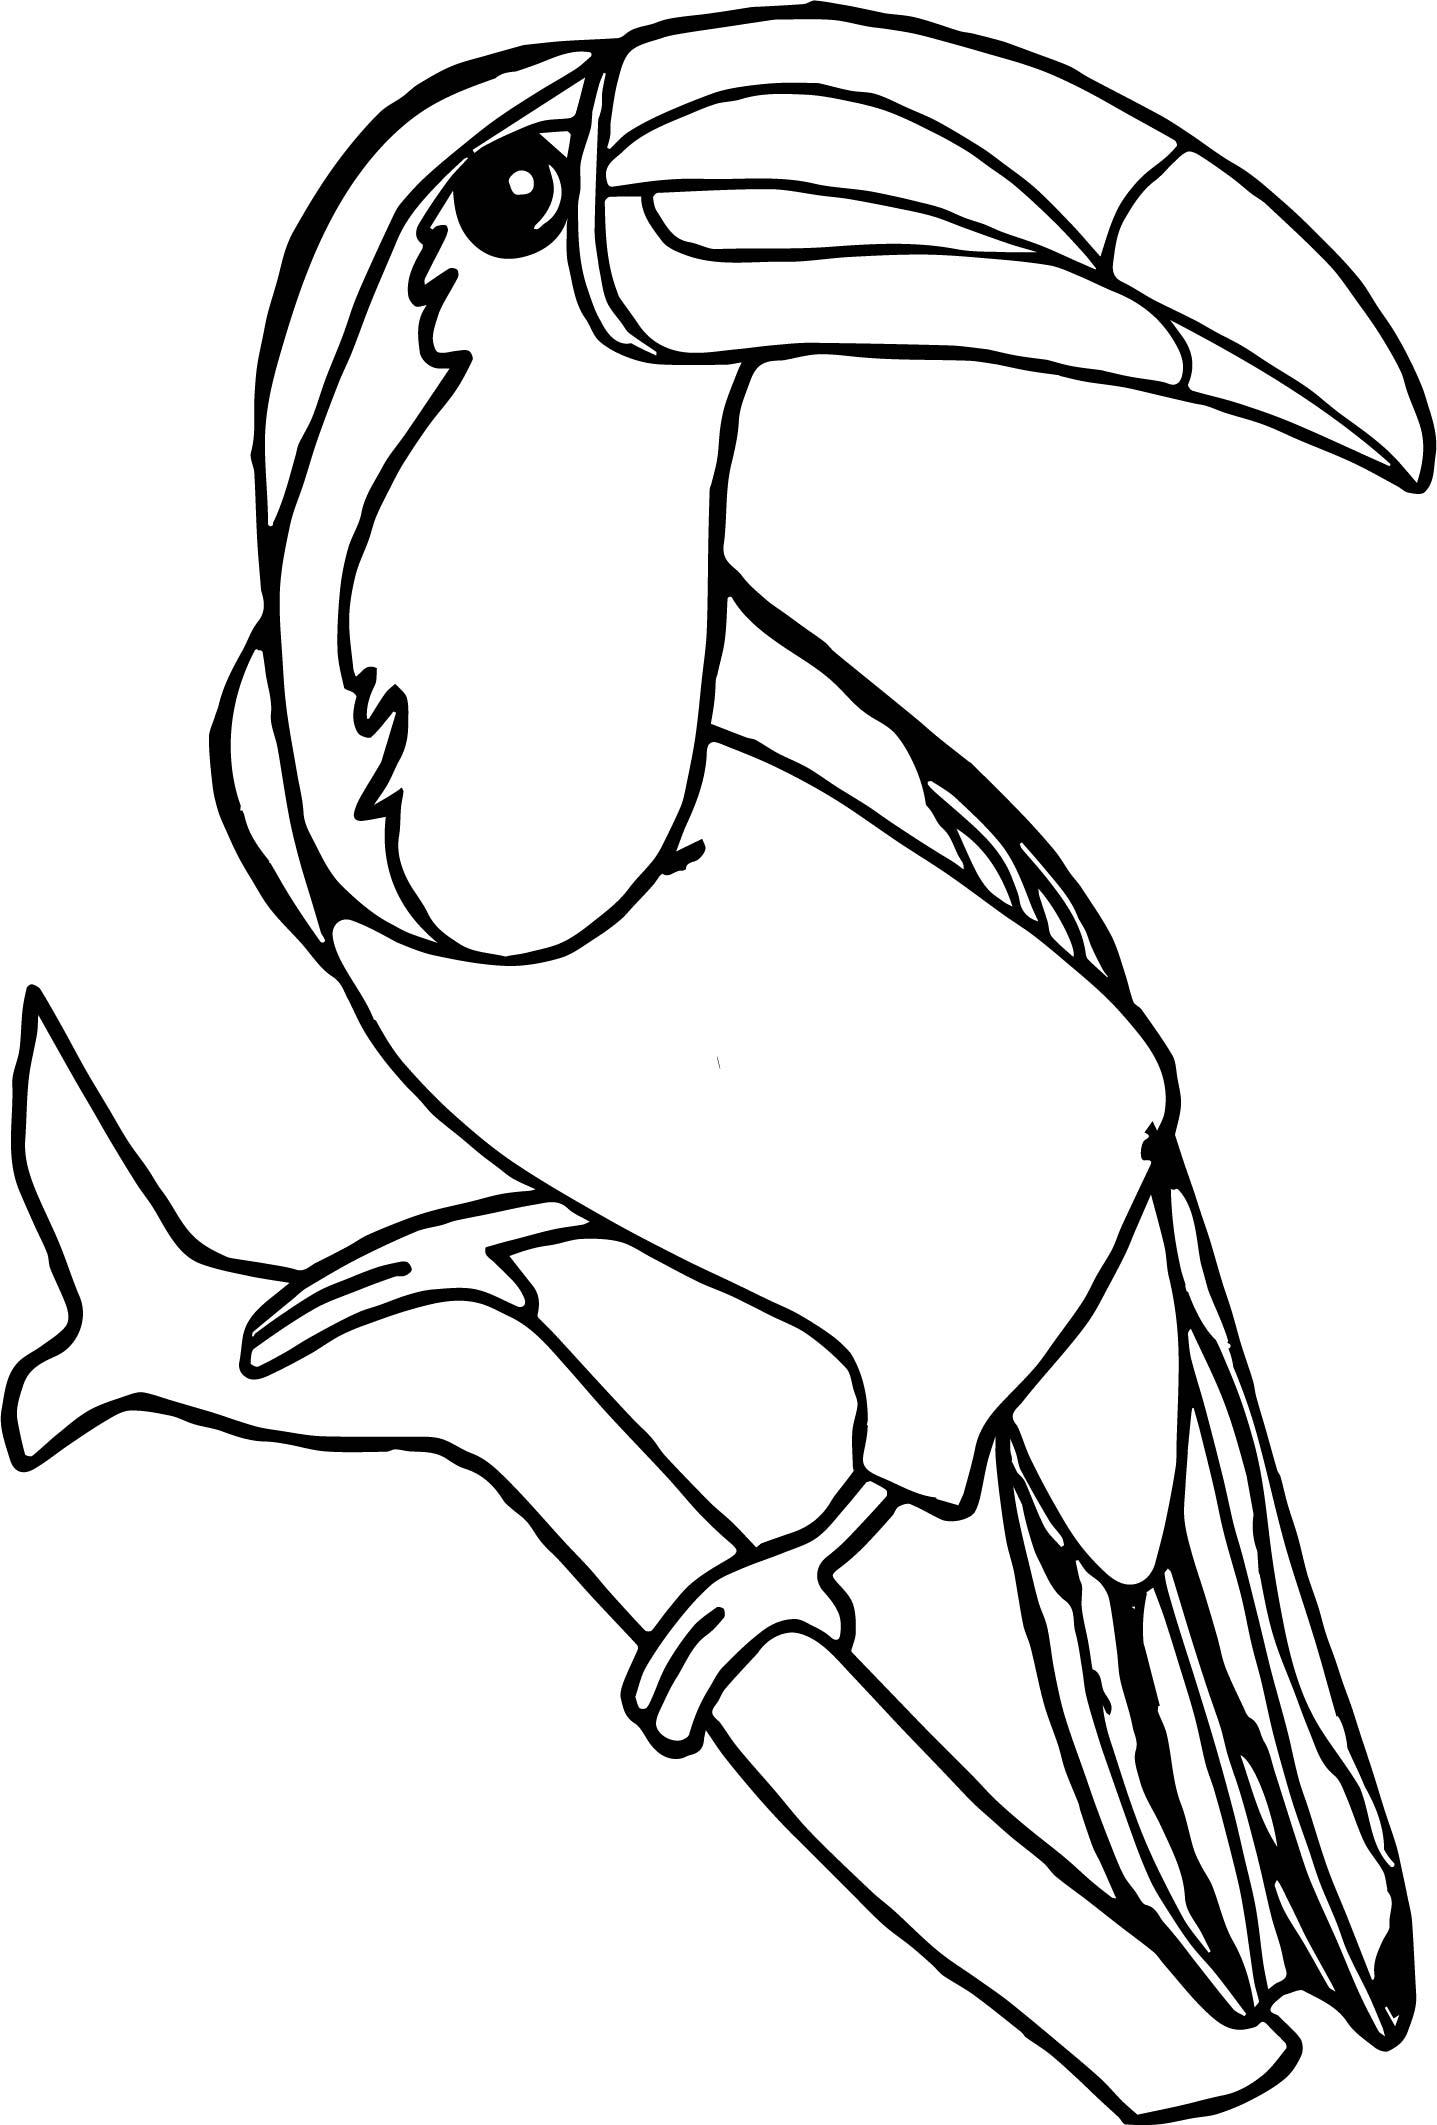 1437x2125 Toucan Color Coloring